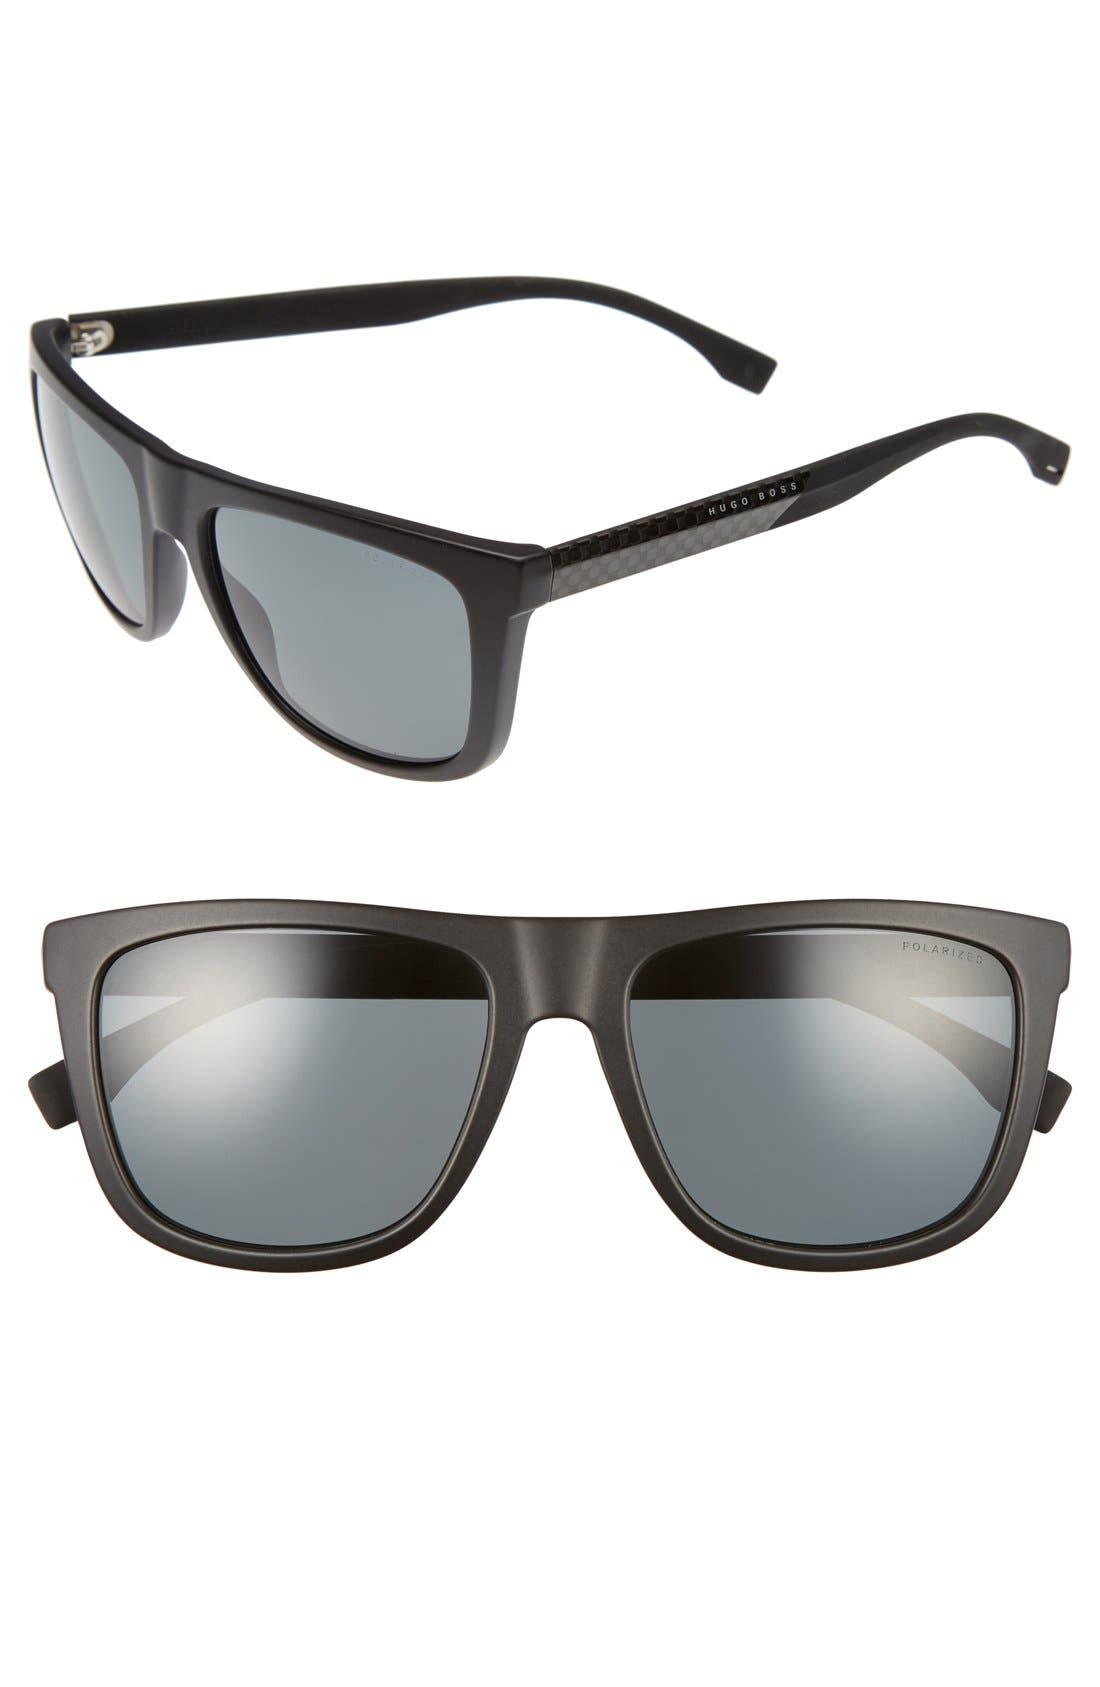 Main Image - BOSS 56mm Polarized Sunglasses